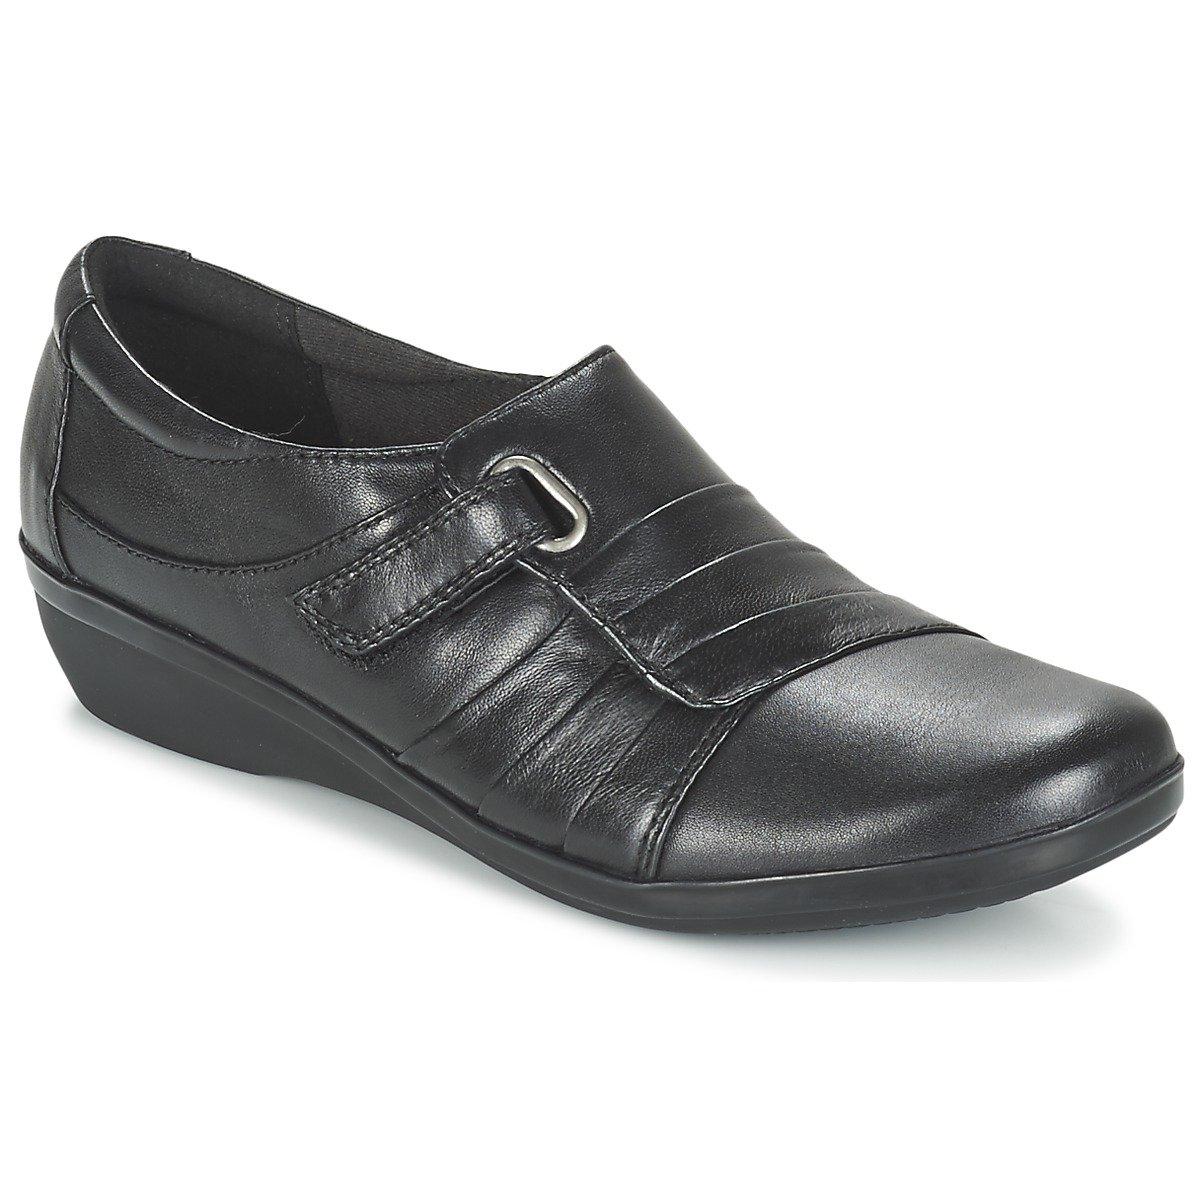 Clarks Everlay Zapatos Casuales De Mujer De Luna 37.5 EU|Black